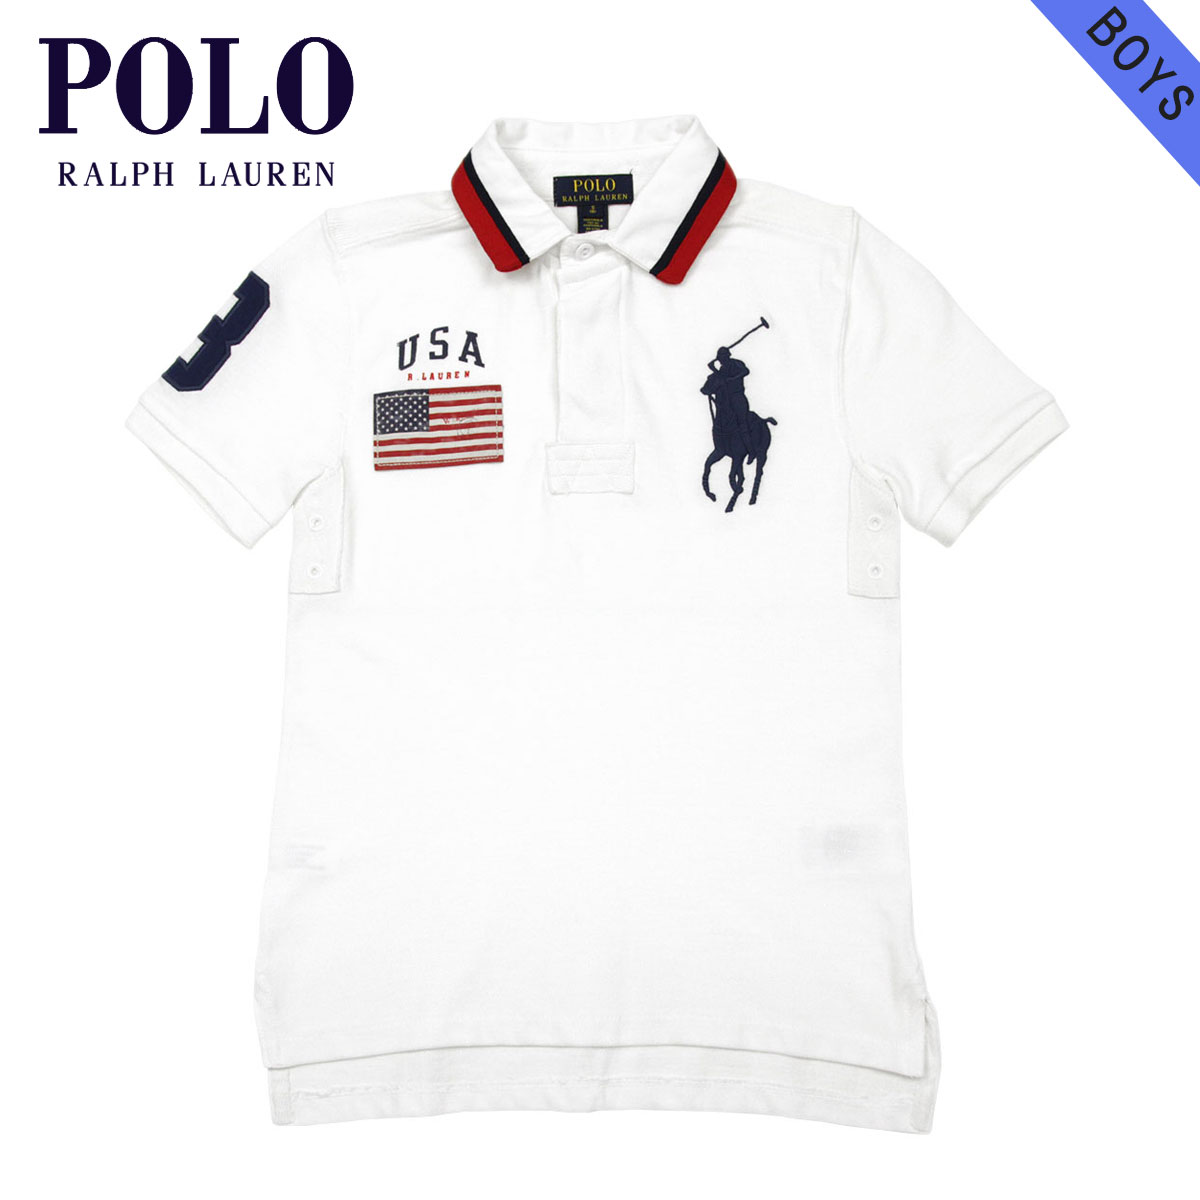 69abd9784e40 Polo Ralph Lauren kids POLO RALPH LAUREN CHILDREN regular article children s  clothes boys polo shirt BIG PONY BORDER S S POLO 323591400001 D00S20